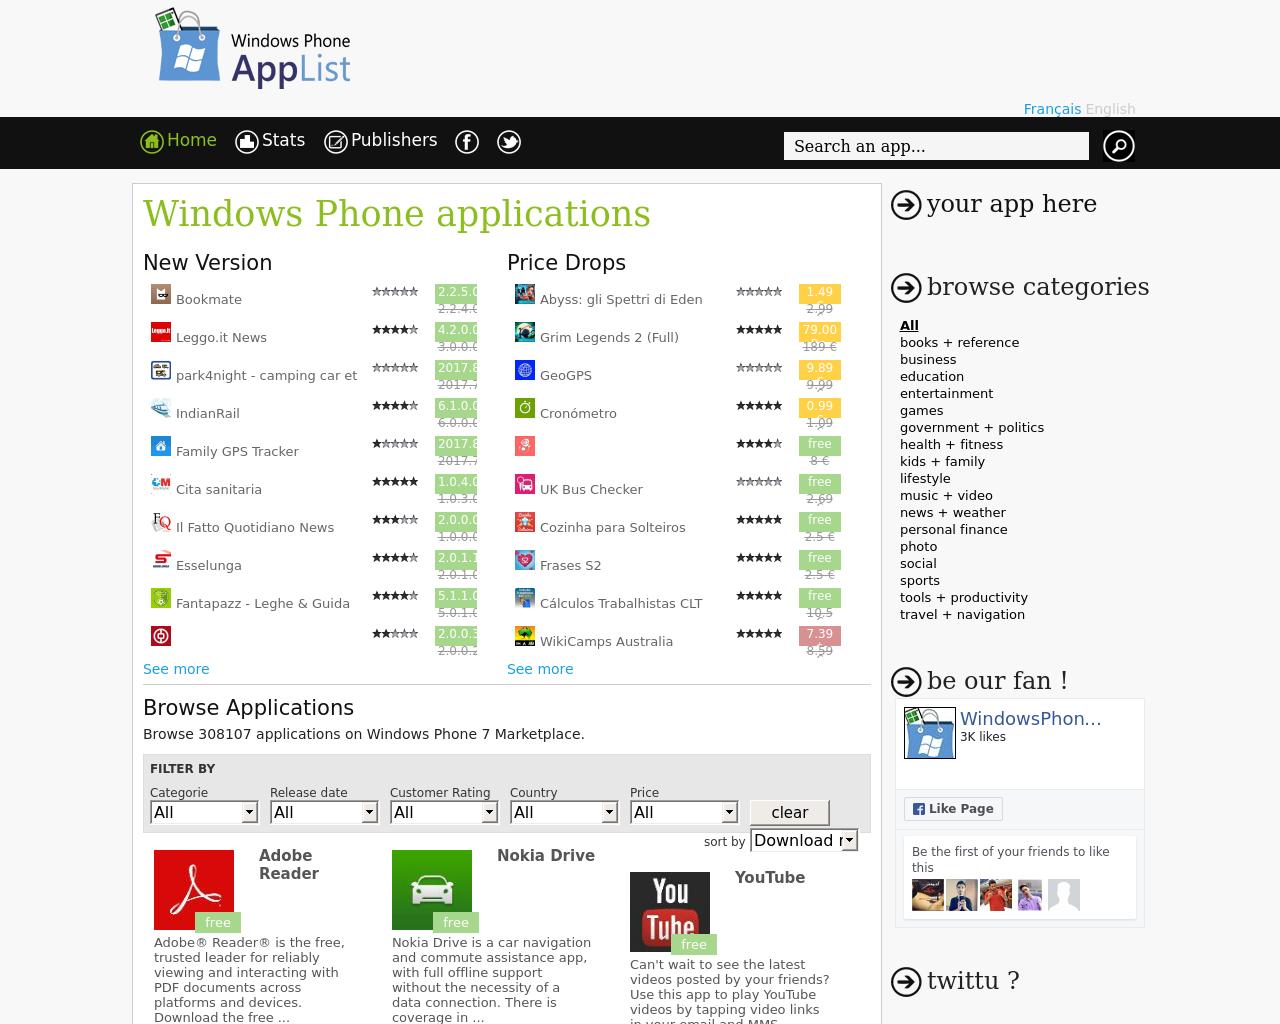 Windows-Phone-AppList-Advertising-Reviews-Pricing